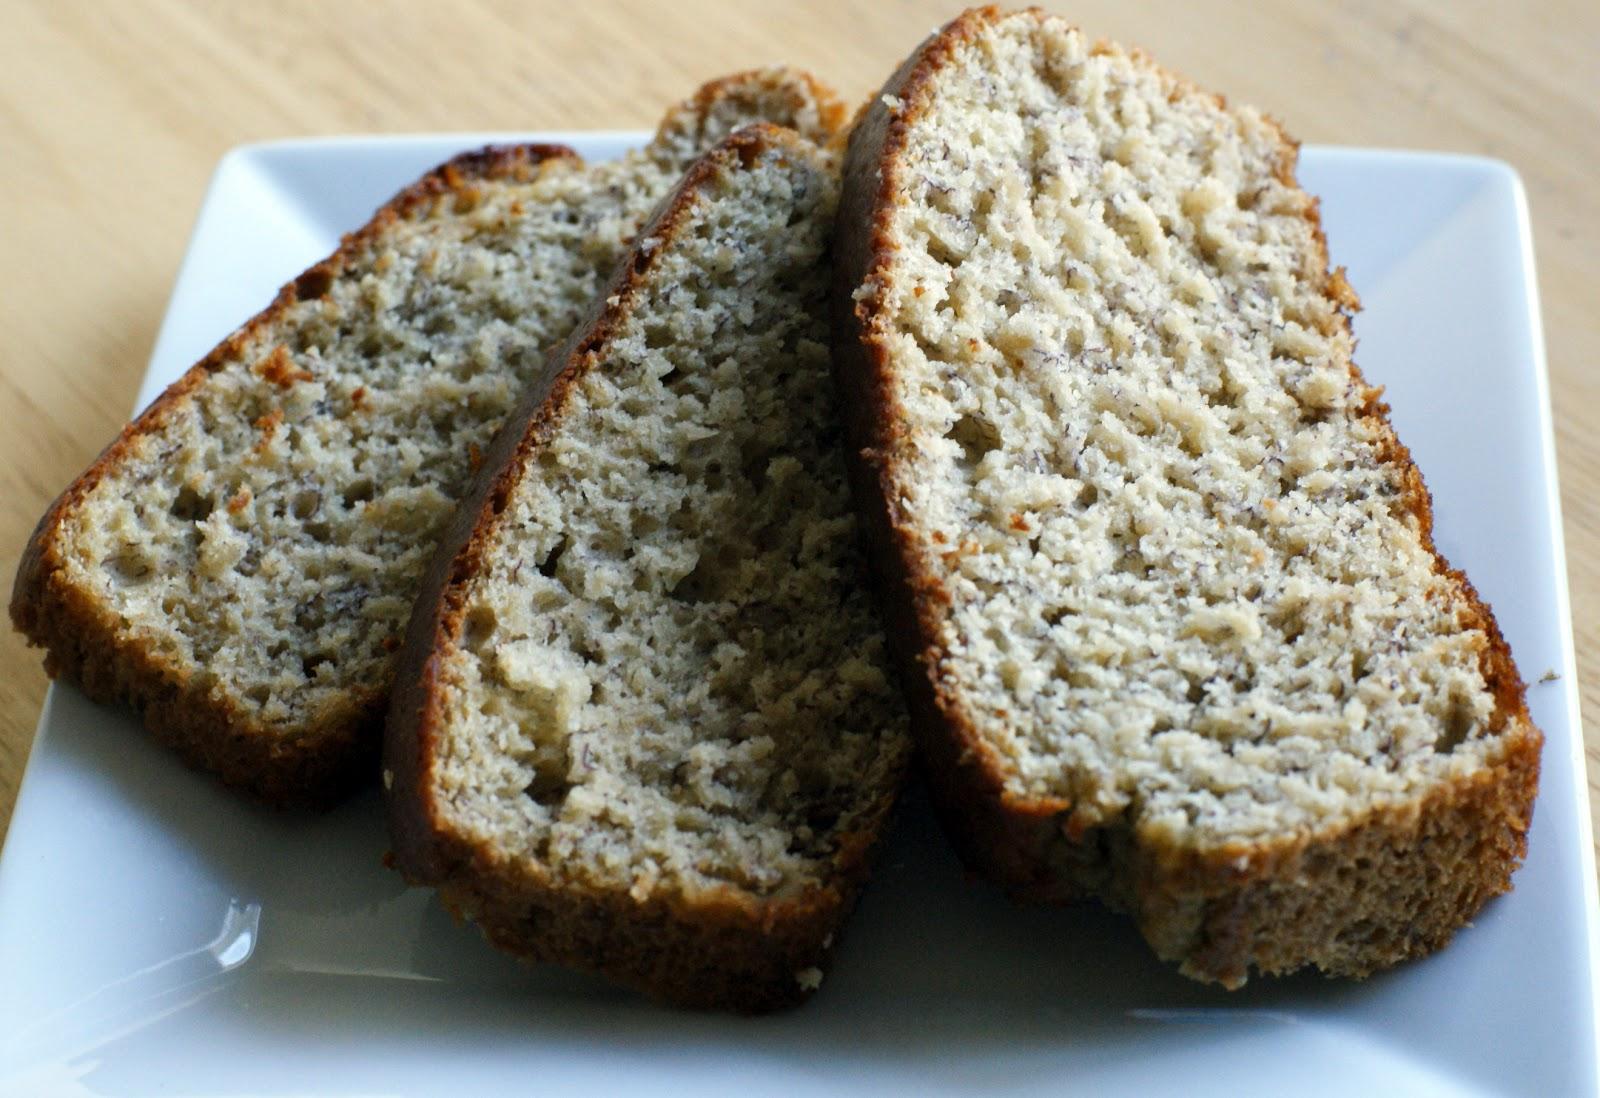 The Merlin Menu: Applesauce Banana Bread